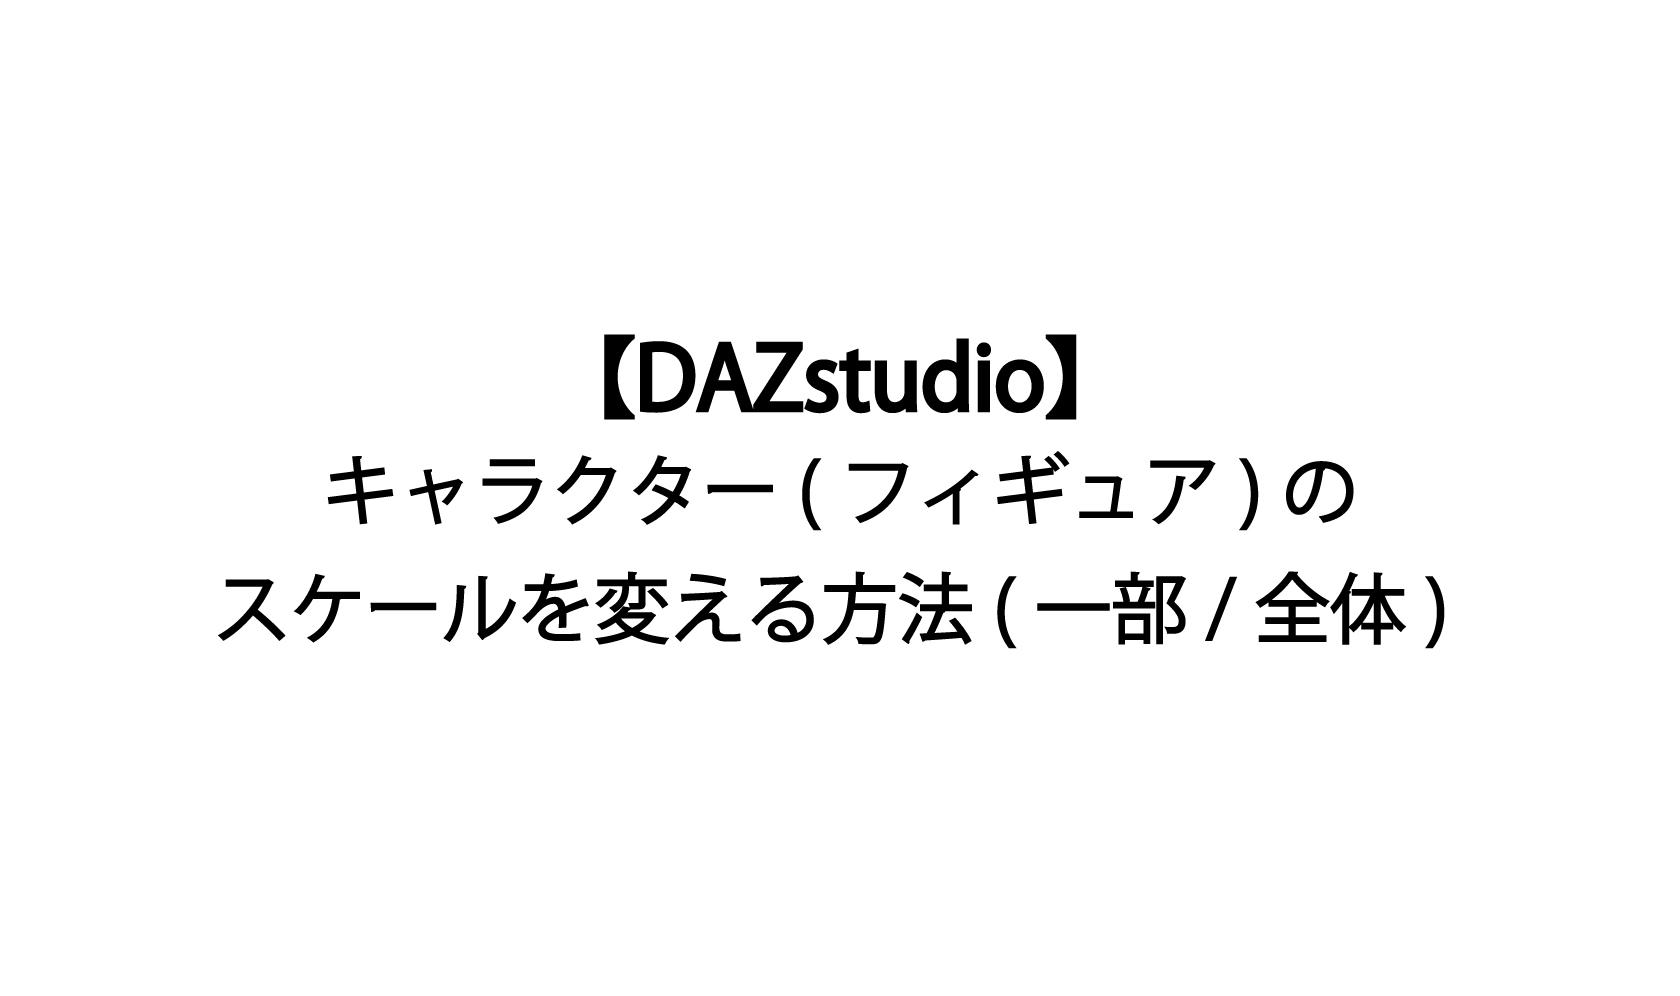 【DAZstudio】キャラクター(フィギュア)のスケールを変える方法(一部・全体)